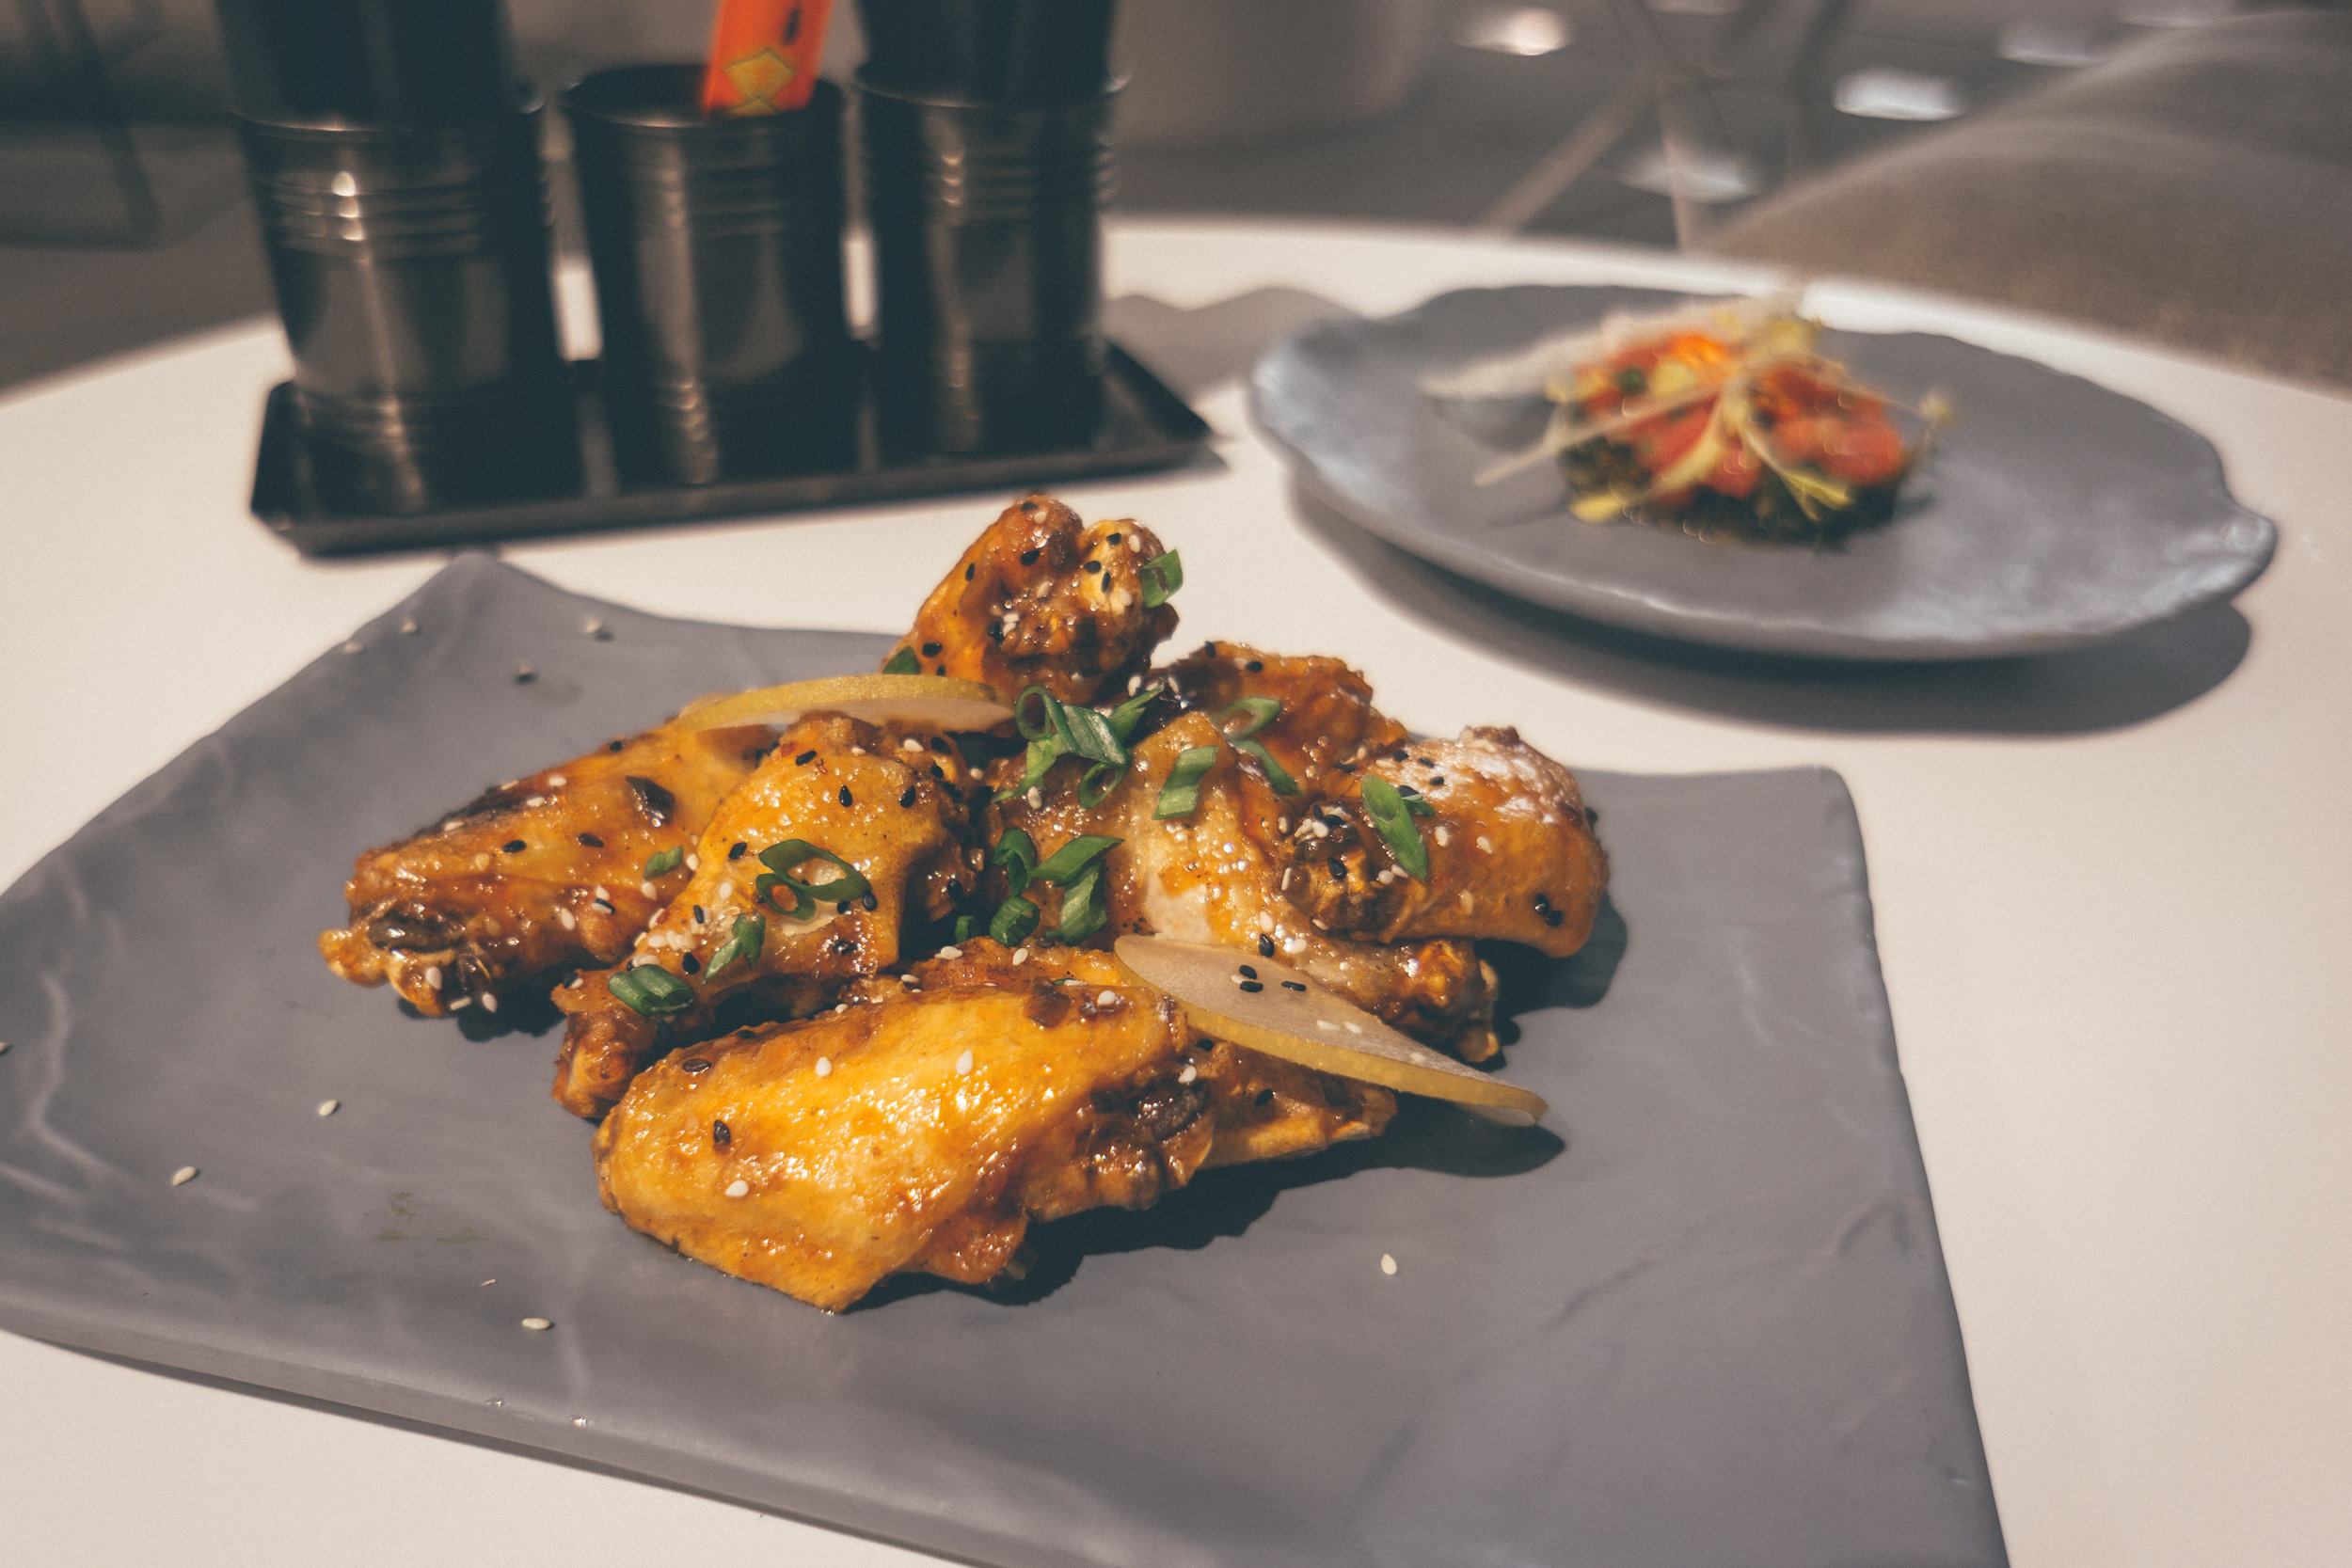 Chili Glazed Wings